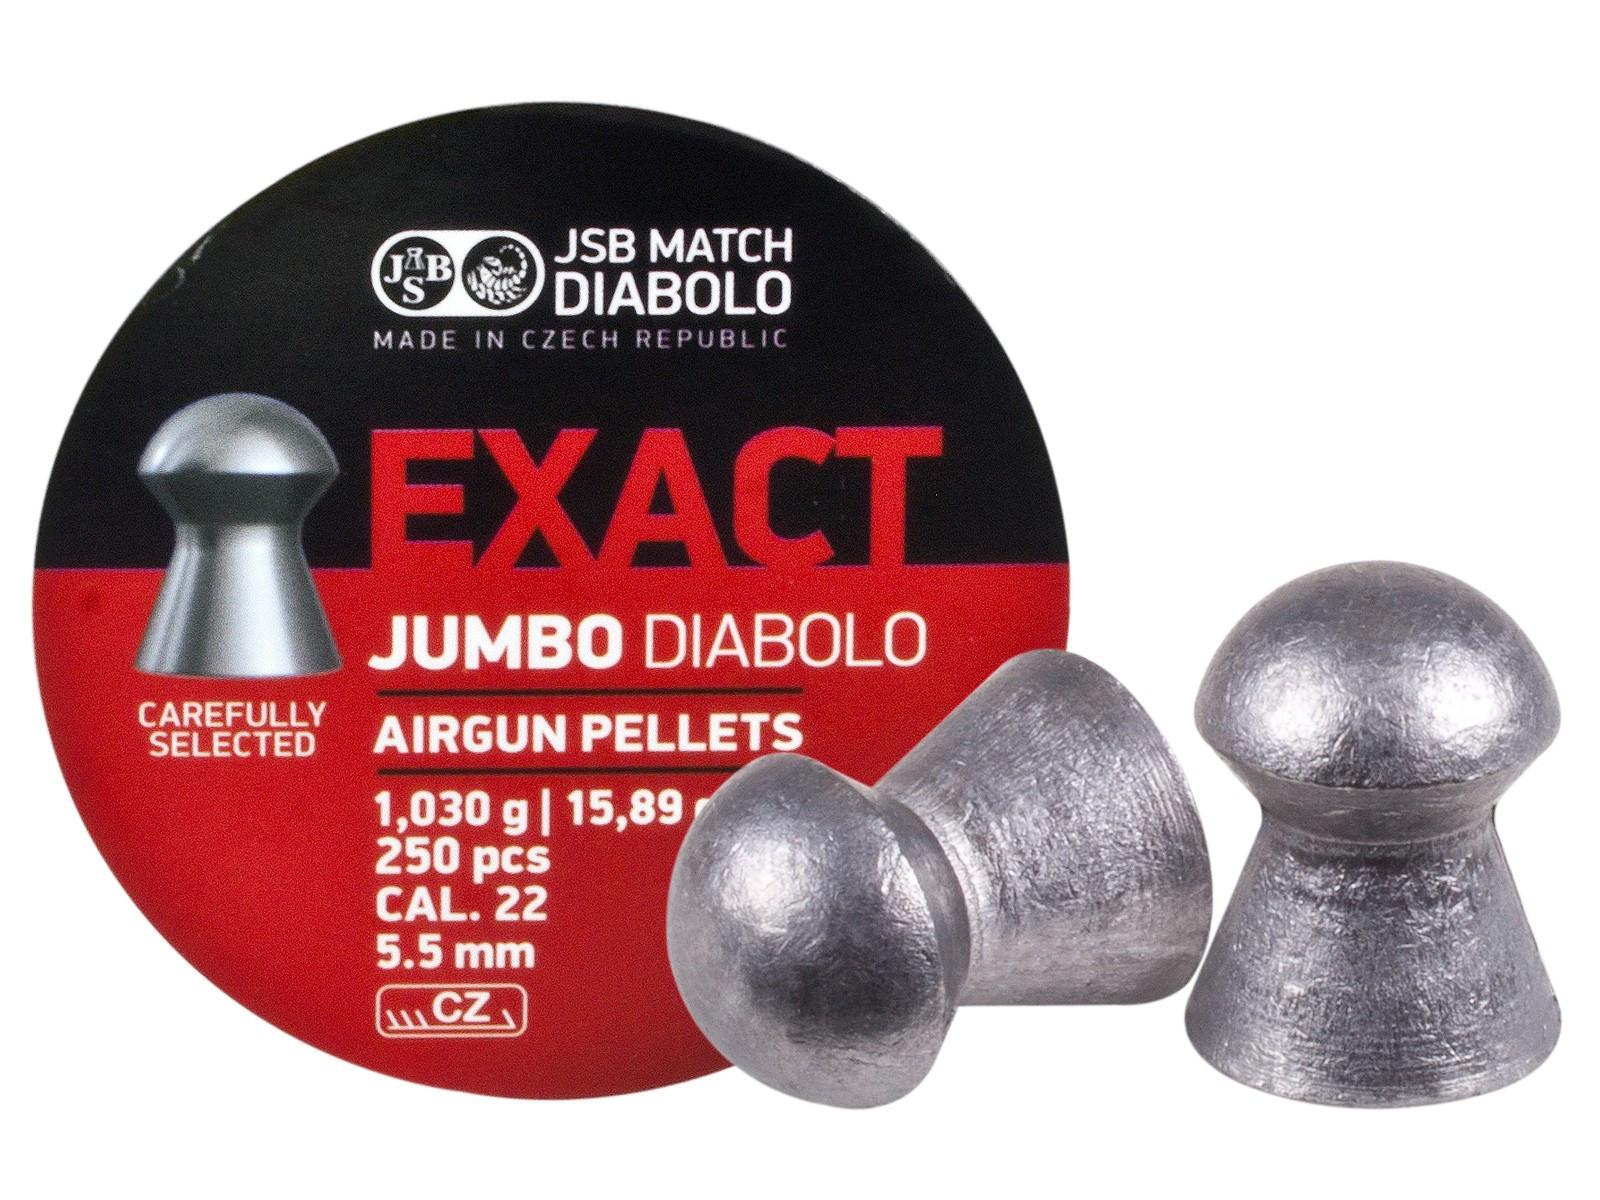 JSB Diabolo Exact Jumbo .22 Cal , 15.89 gr - 250 ct